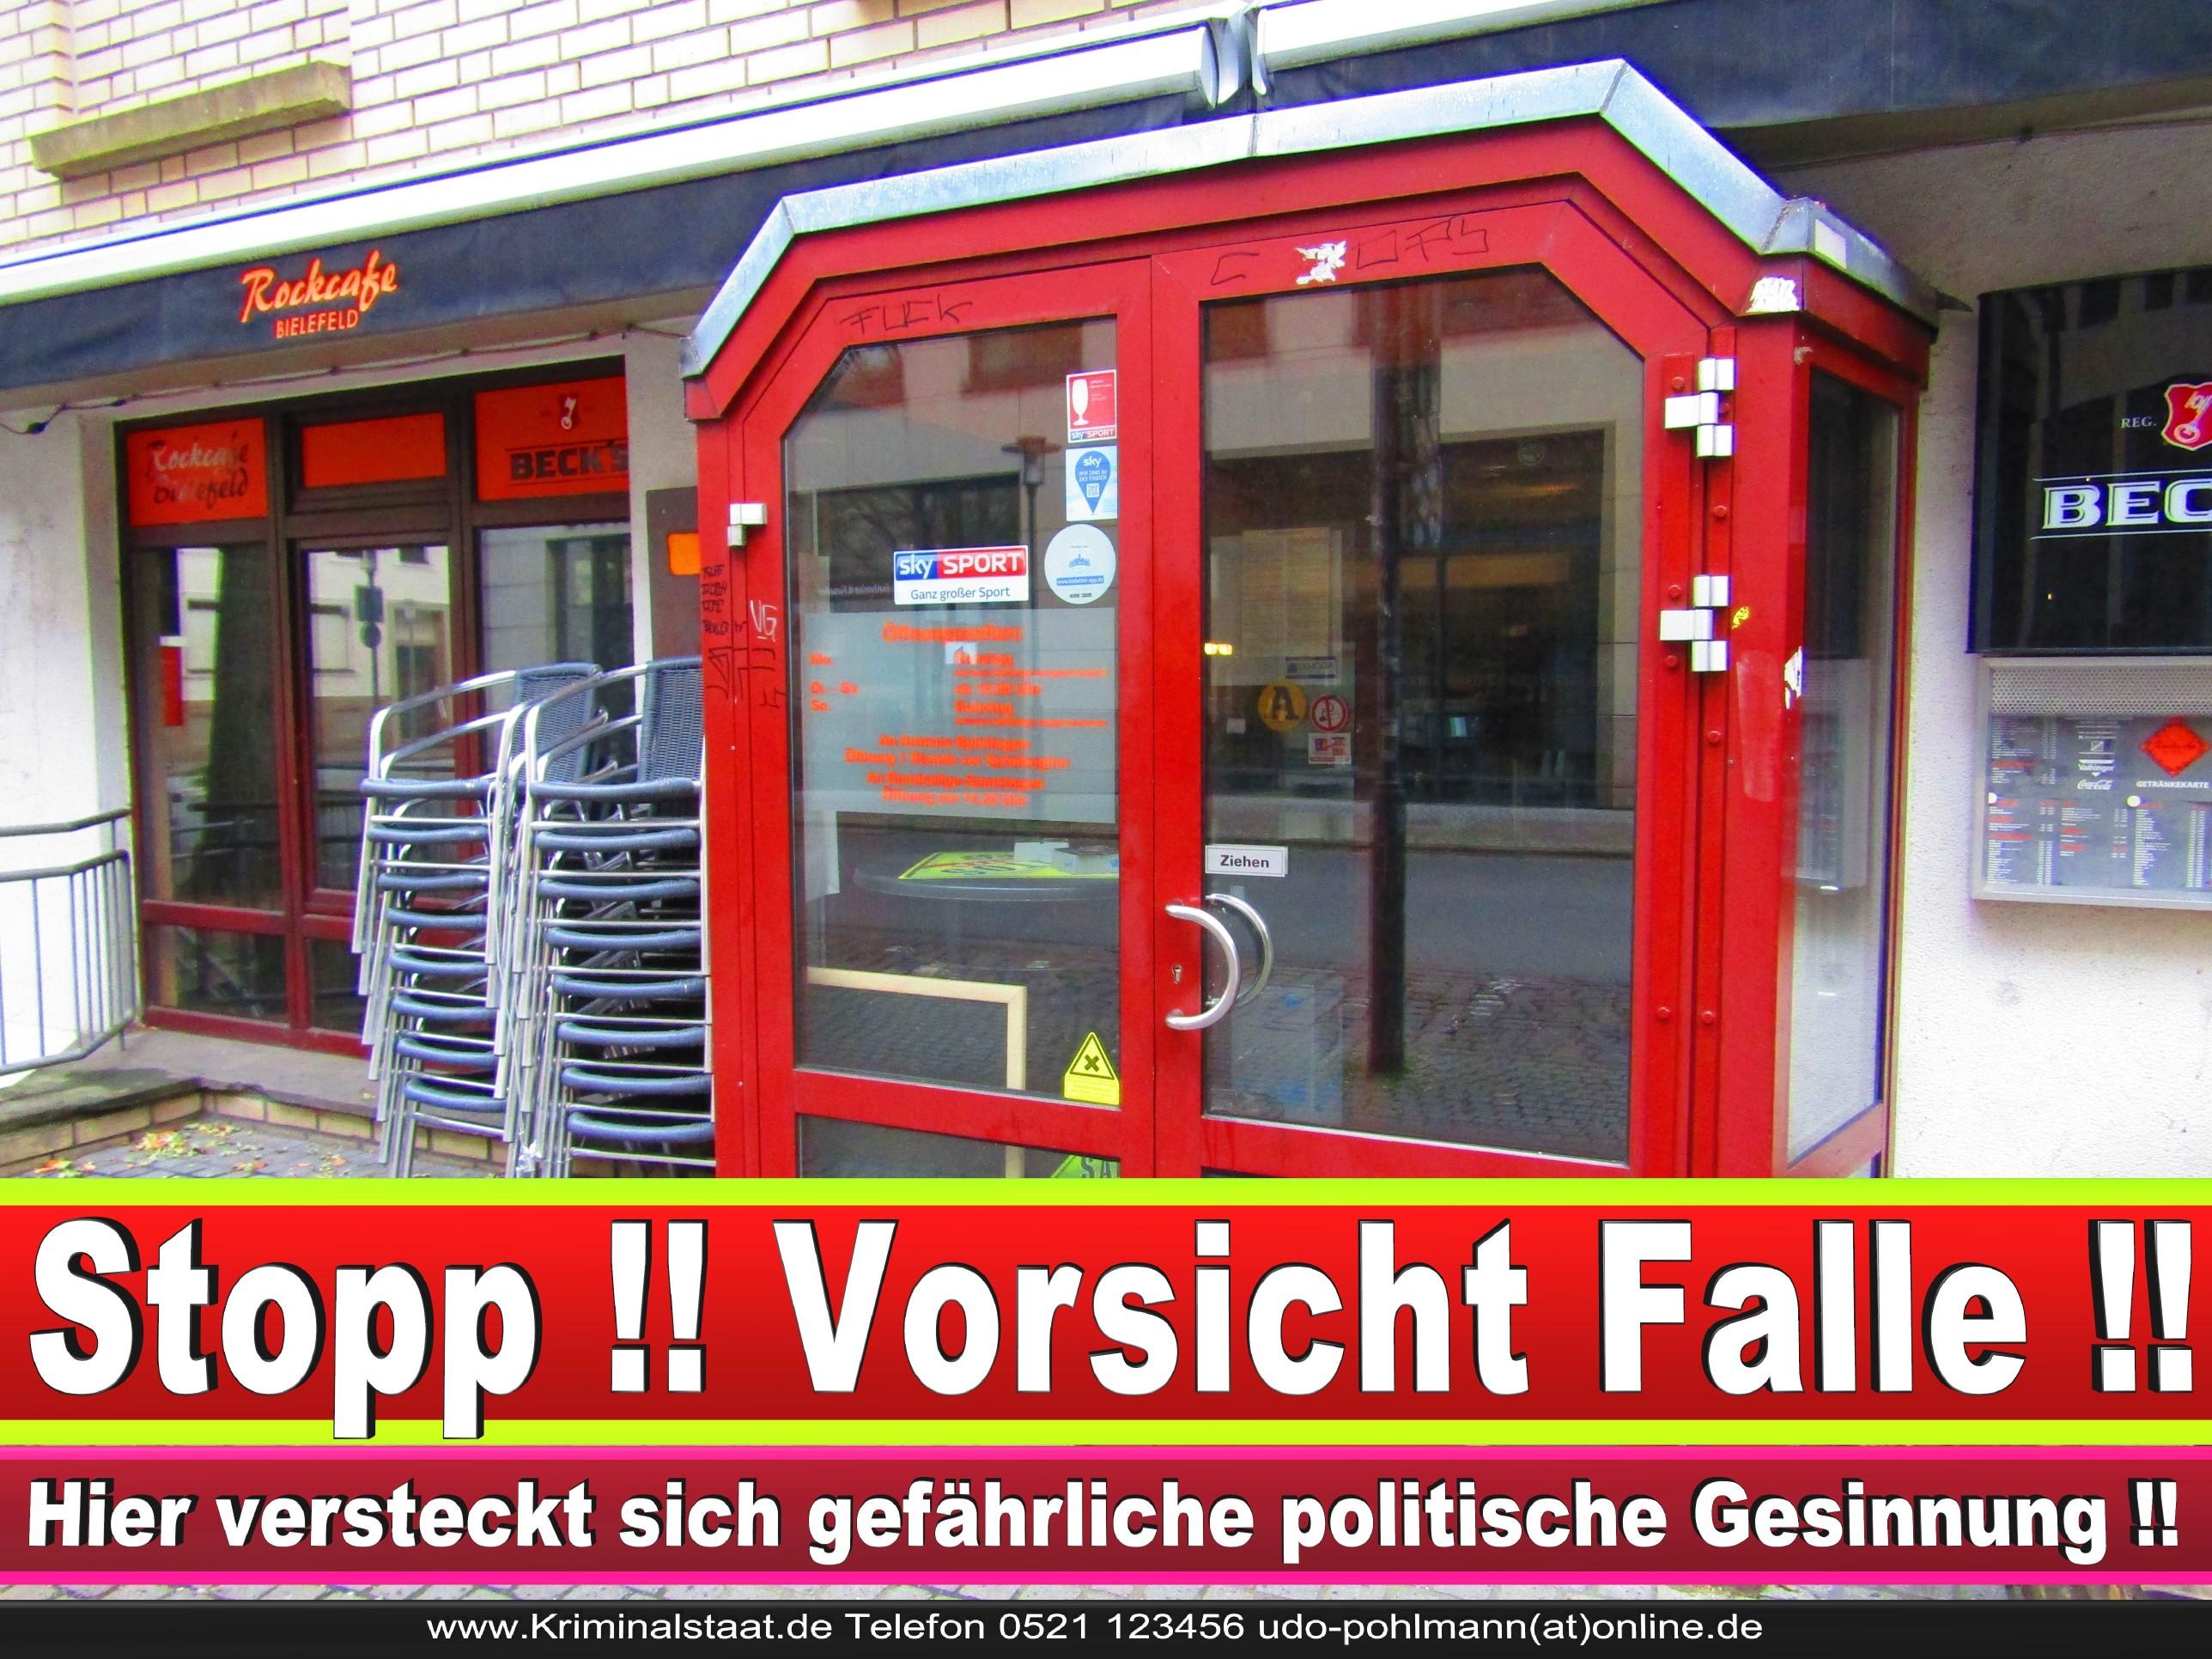 Rockcafe Bielefeld Neustädter Str 25 33602 CDU Bielefeld NRW 9